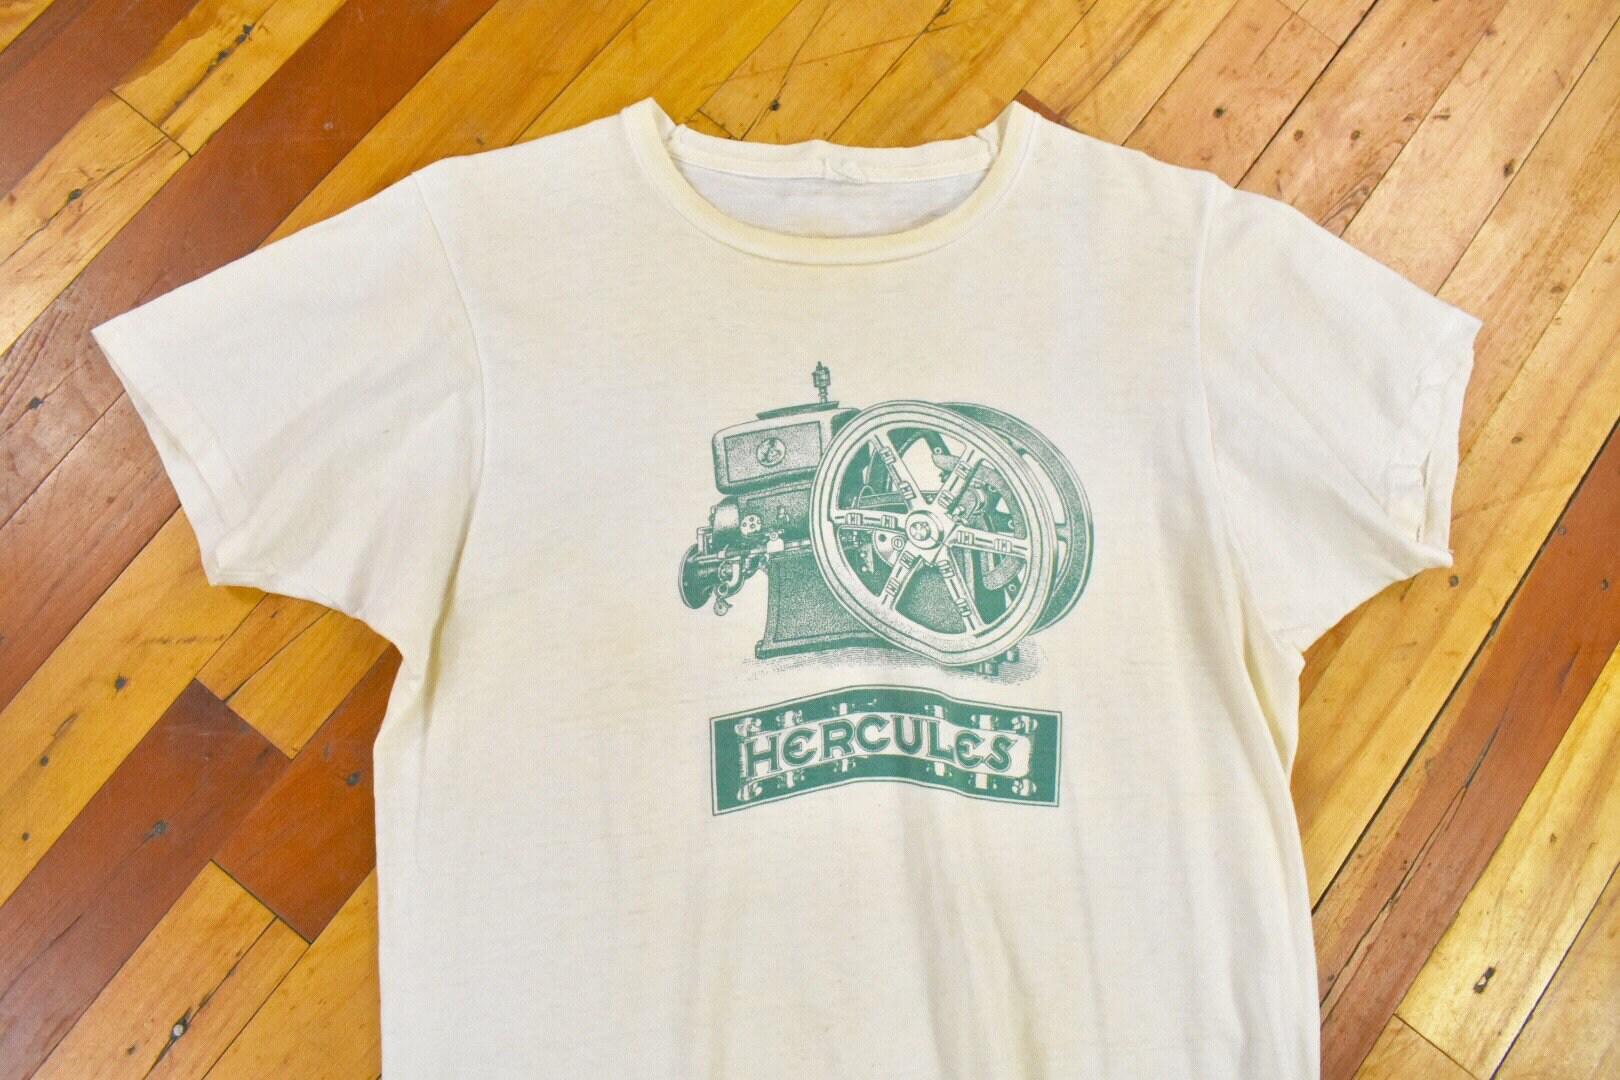 1970s Men's Shirt Styles – Vintage 70s Shirts for Guys 70S Hercules Engine Co. ML Tee Vintage T-Shirt $50.00 AT vintagedancer.com